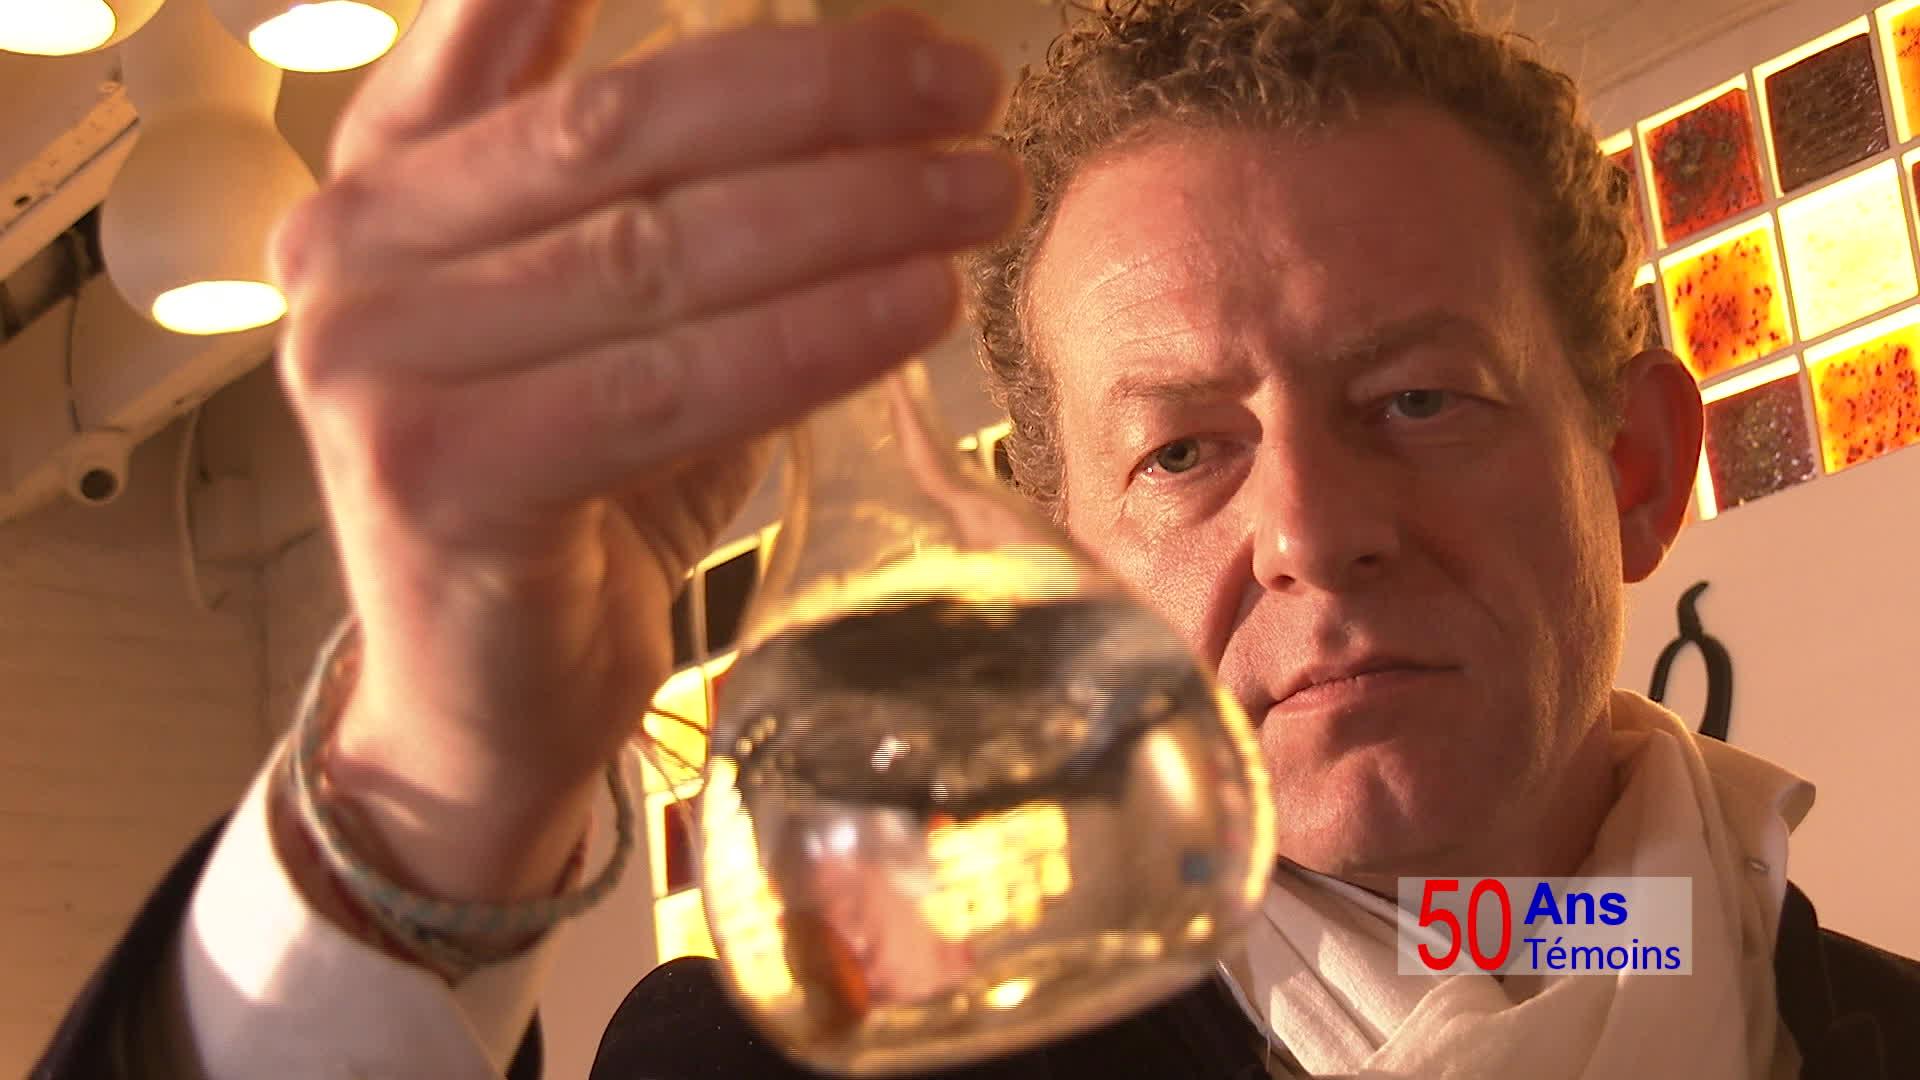 Jean Zimmermann : alchimiste en cosmétique